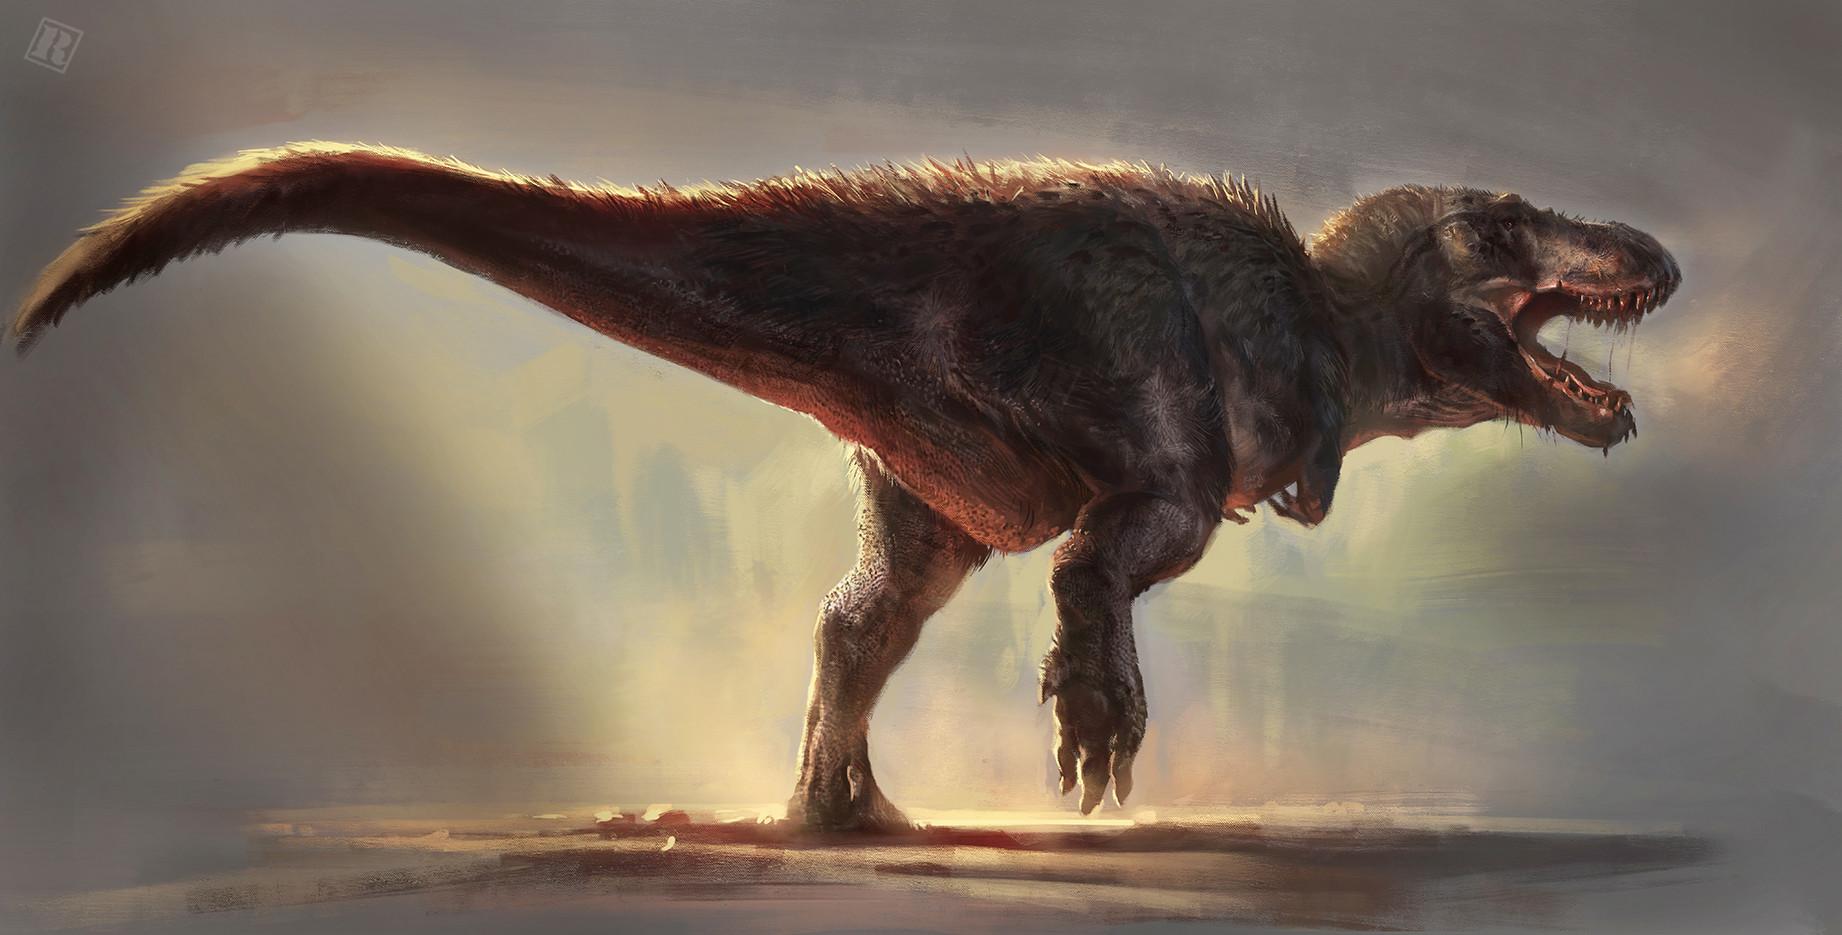 Raph lomotan raph04art tyrannosaurus rex by raph04art dakmesu